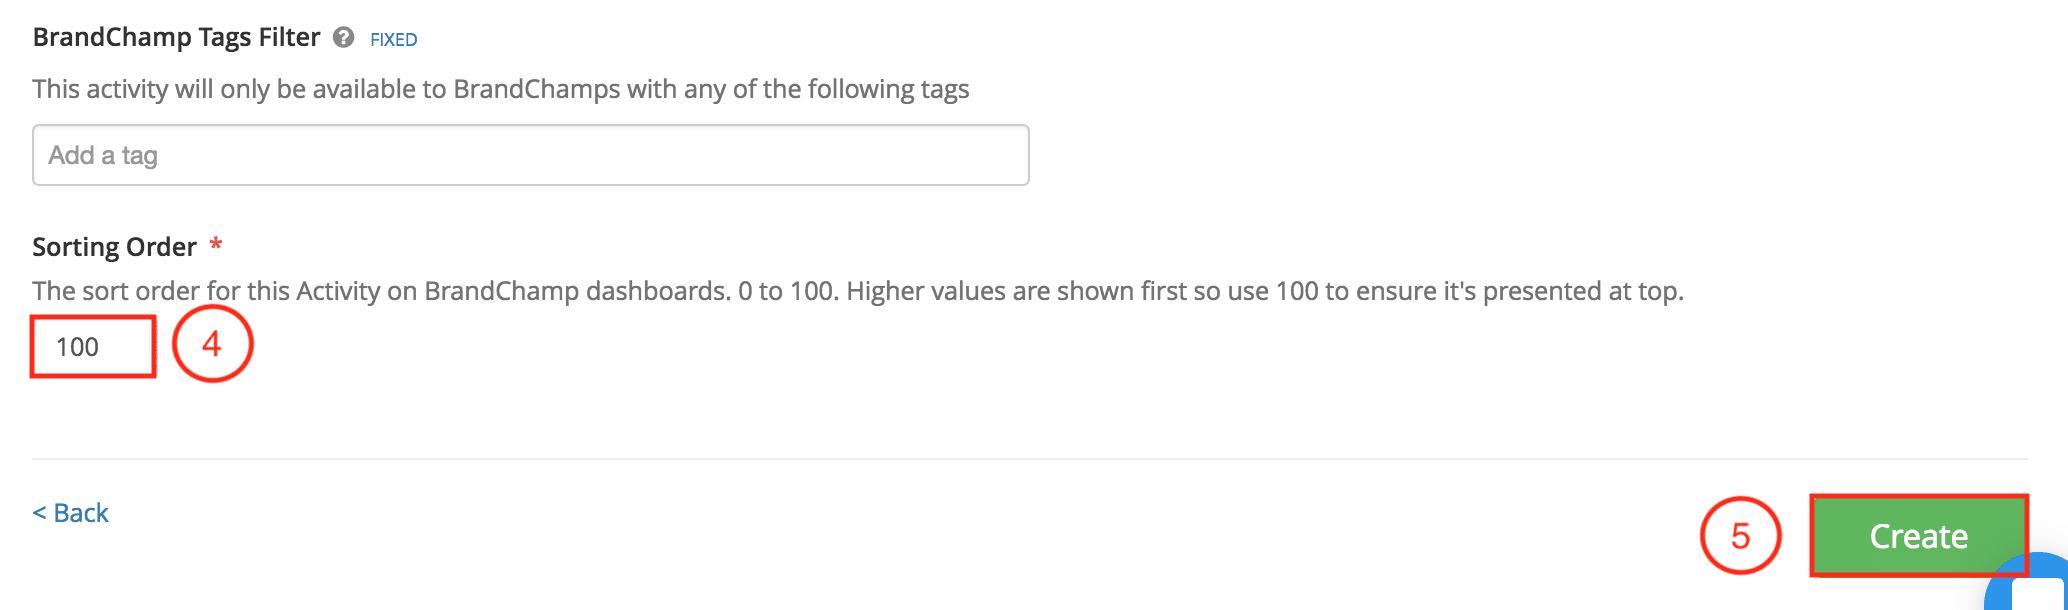 BrandChamp activity prsentation tag filter sorting order